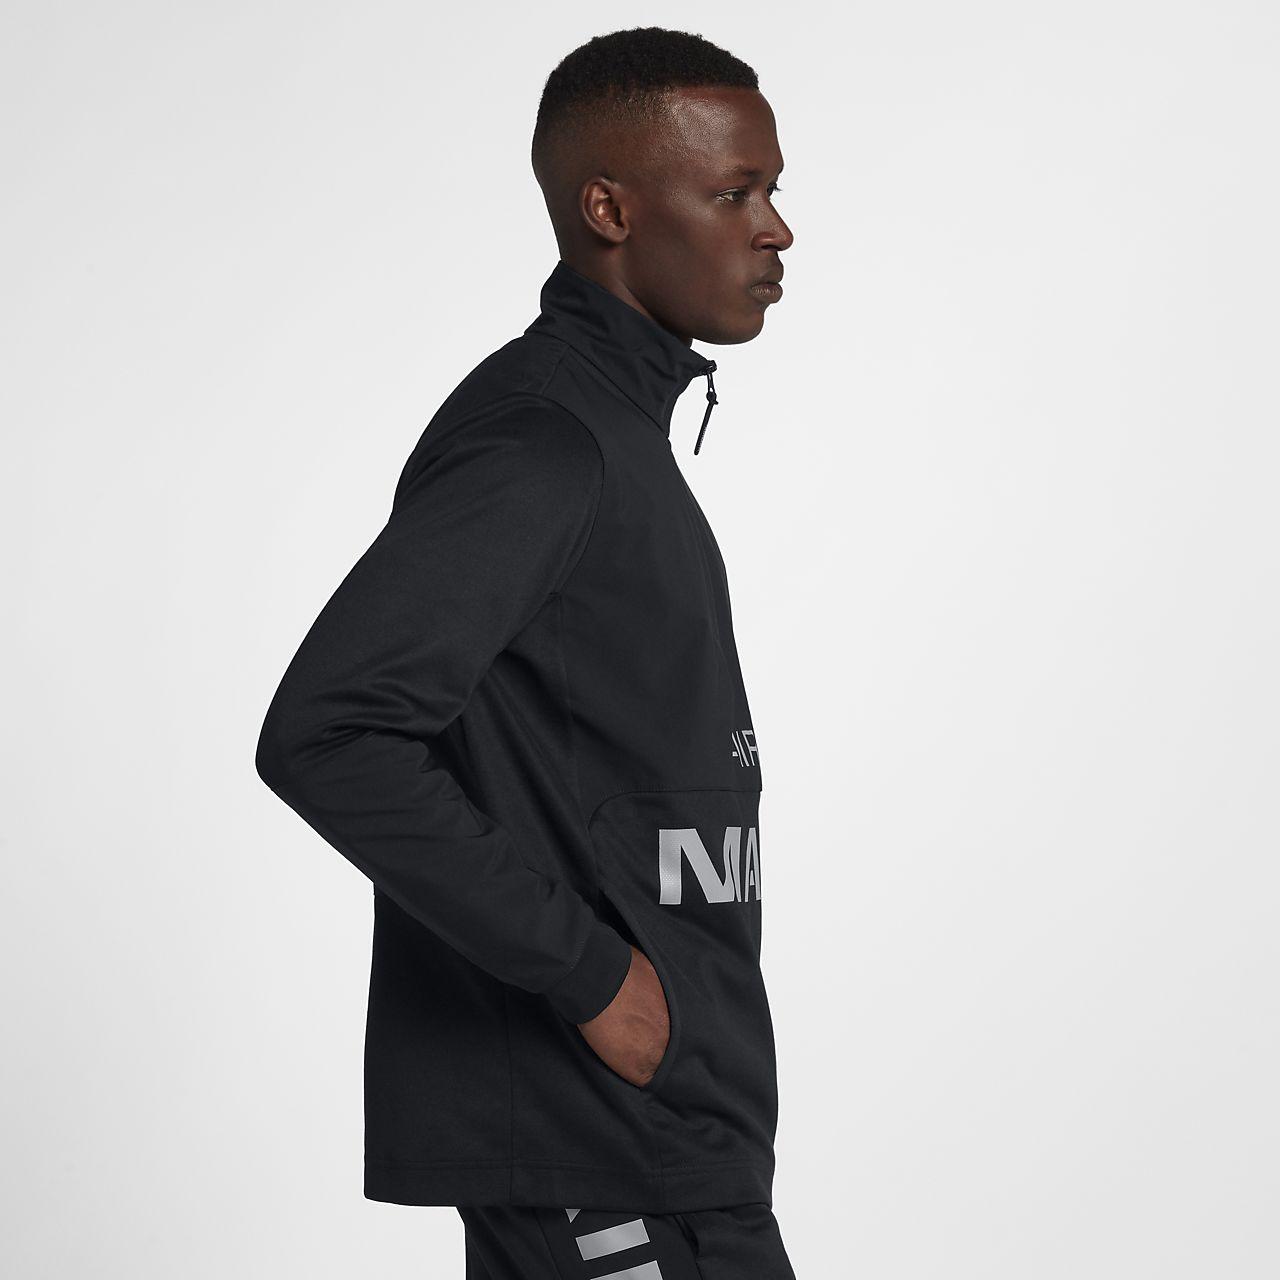 buy popular dd67b bf245 ... Jacka Nike Sportswear Air Max för män